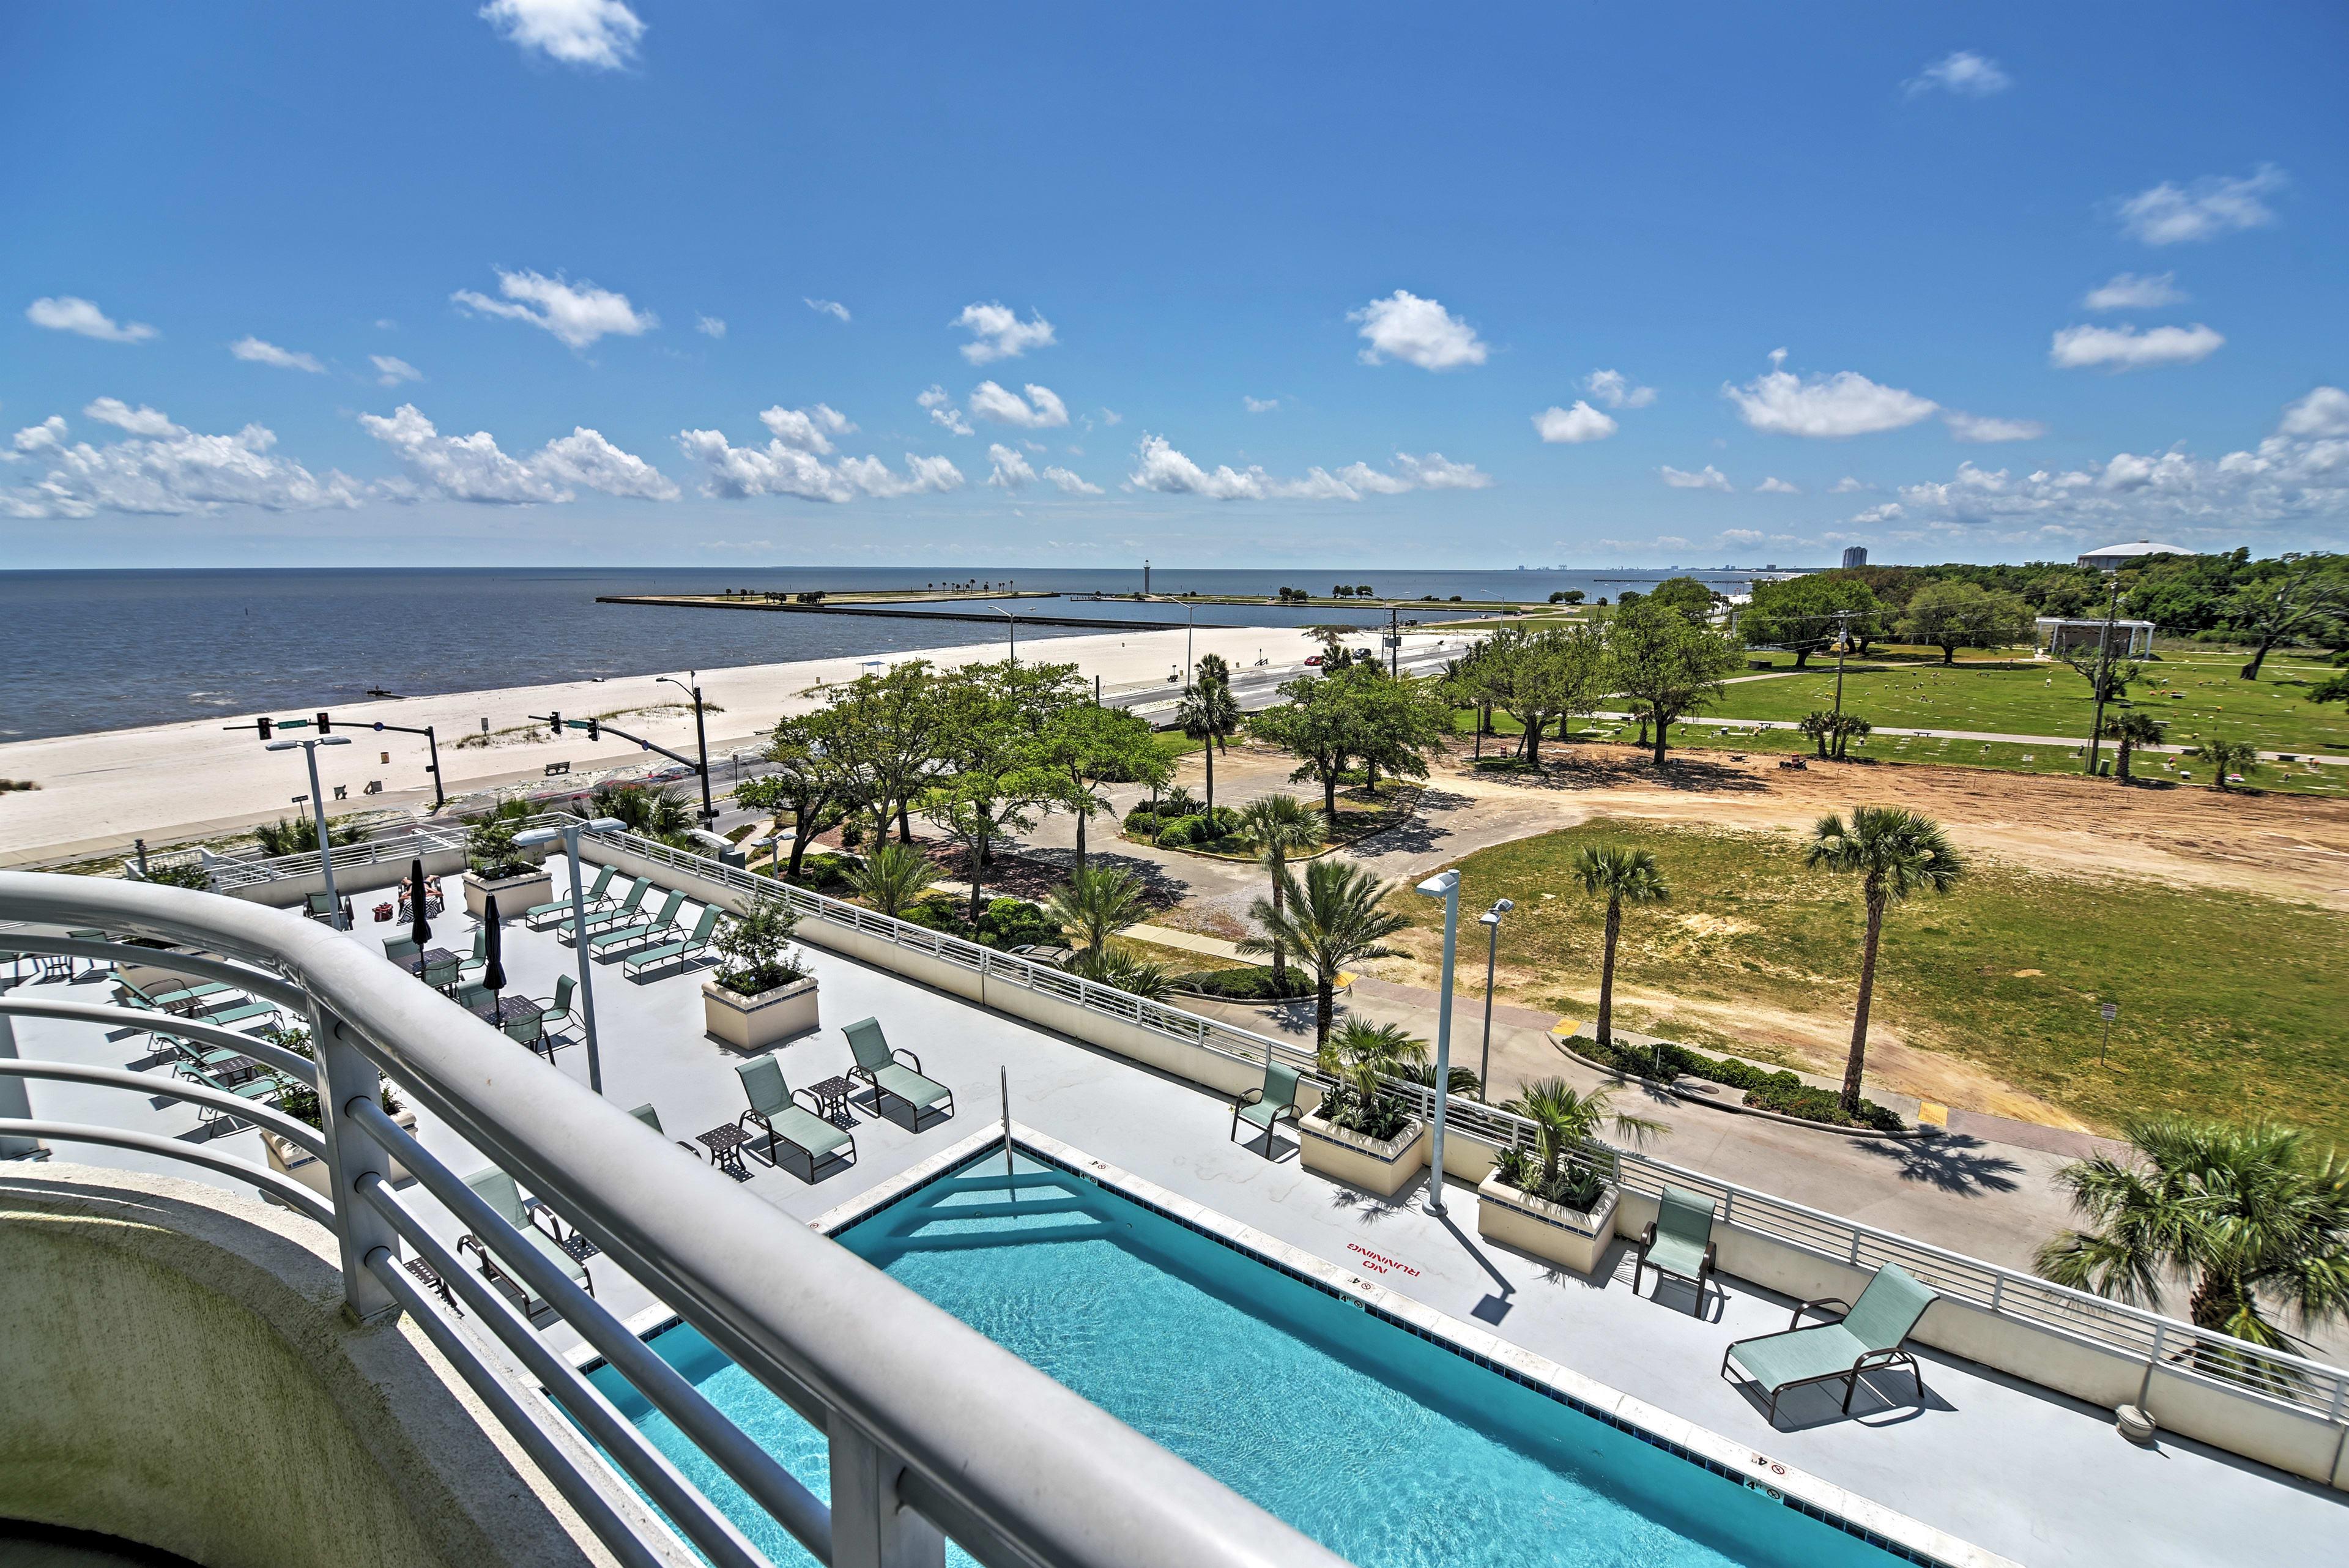 Book your Biloxi beach vacation at this beachside condo at Ocean Club!